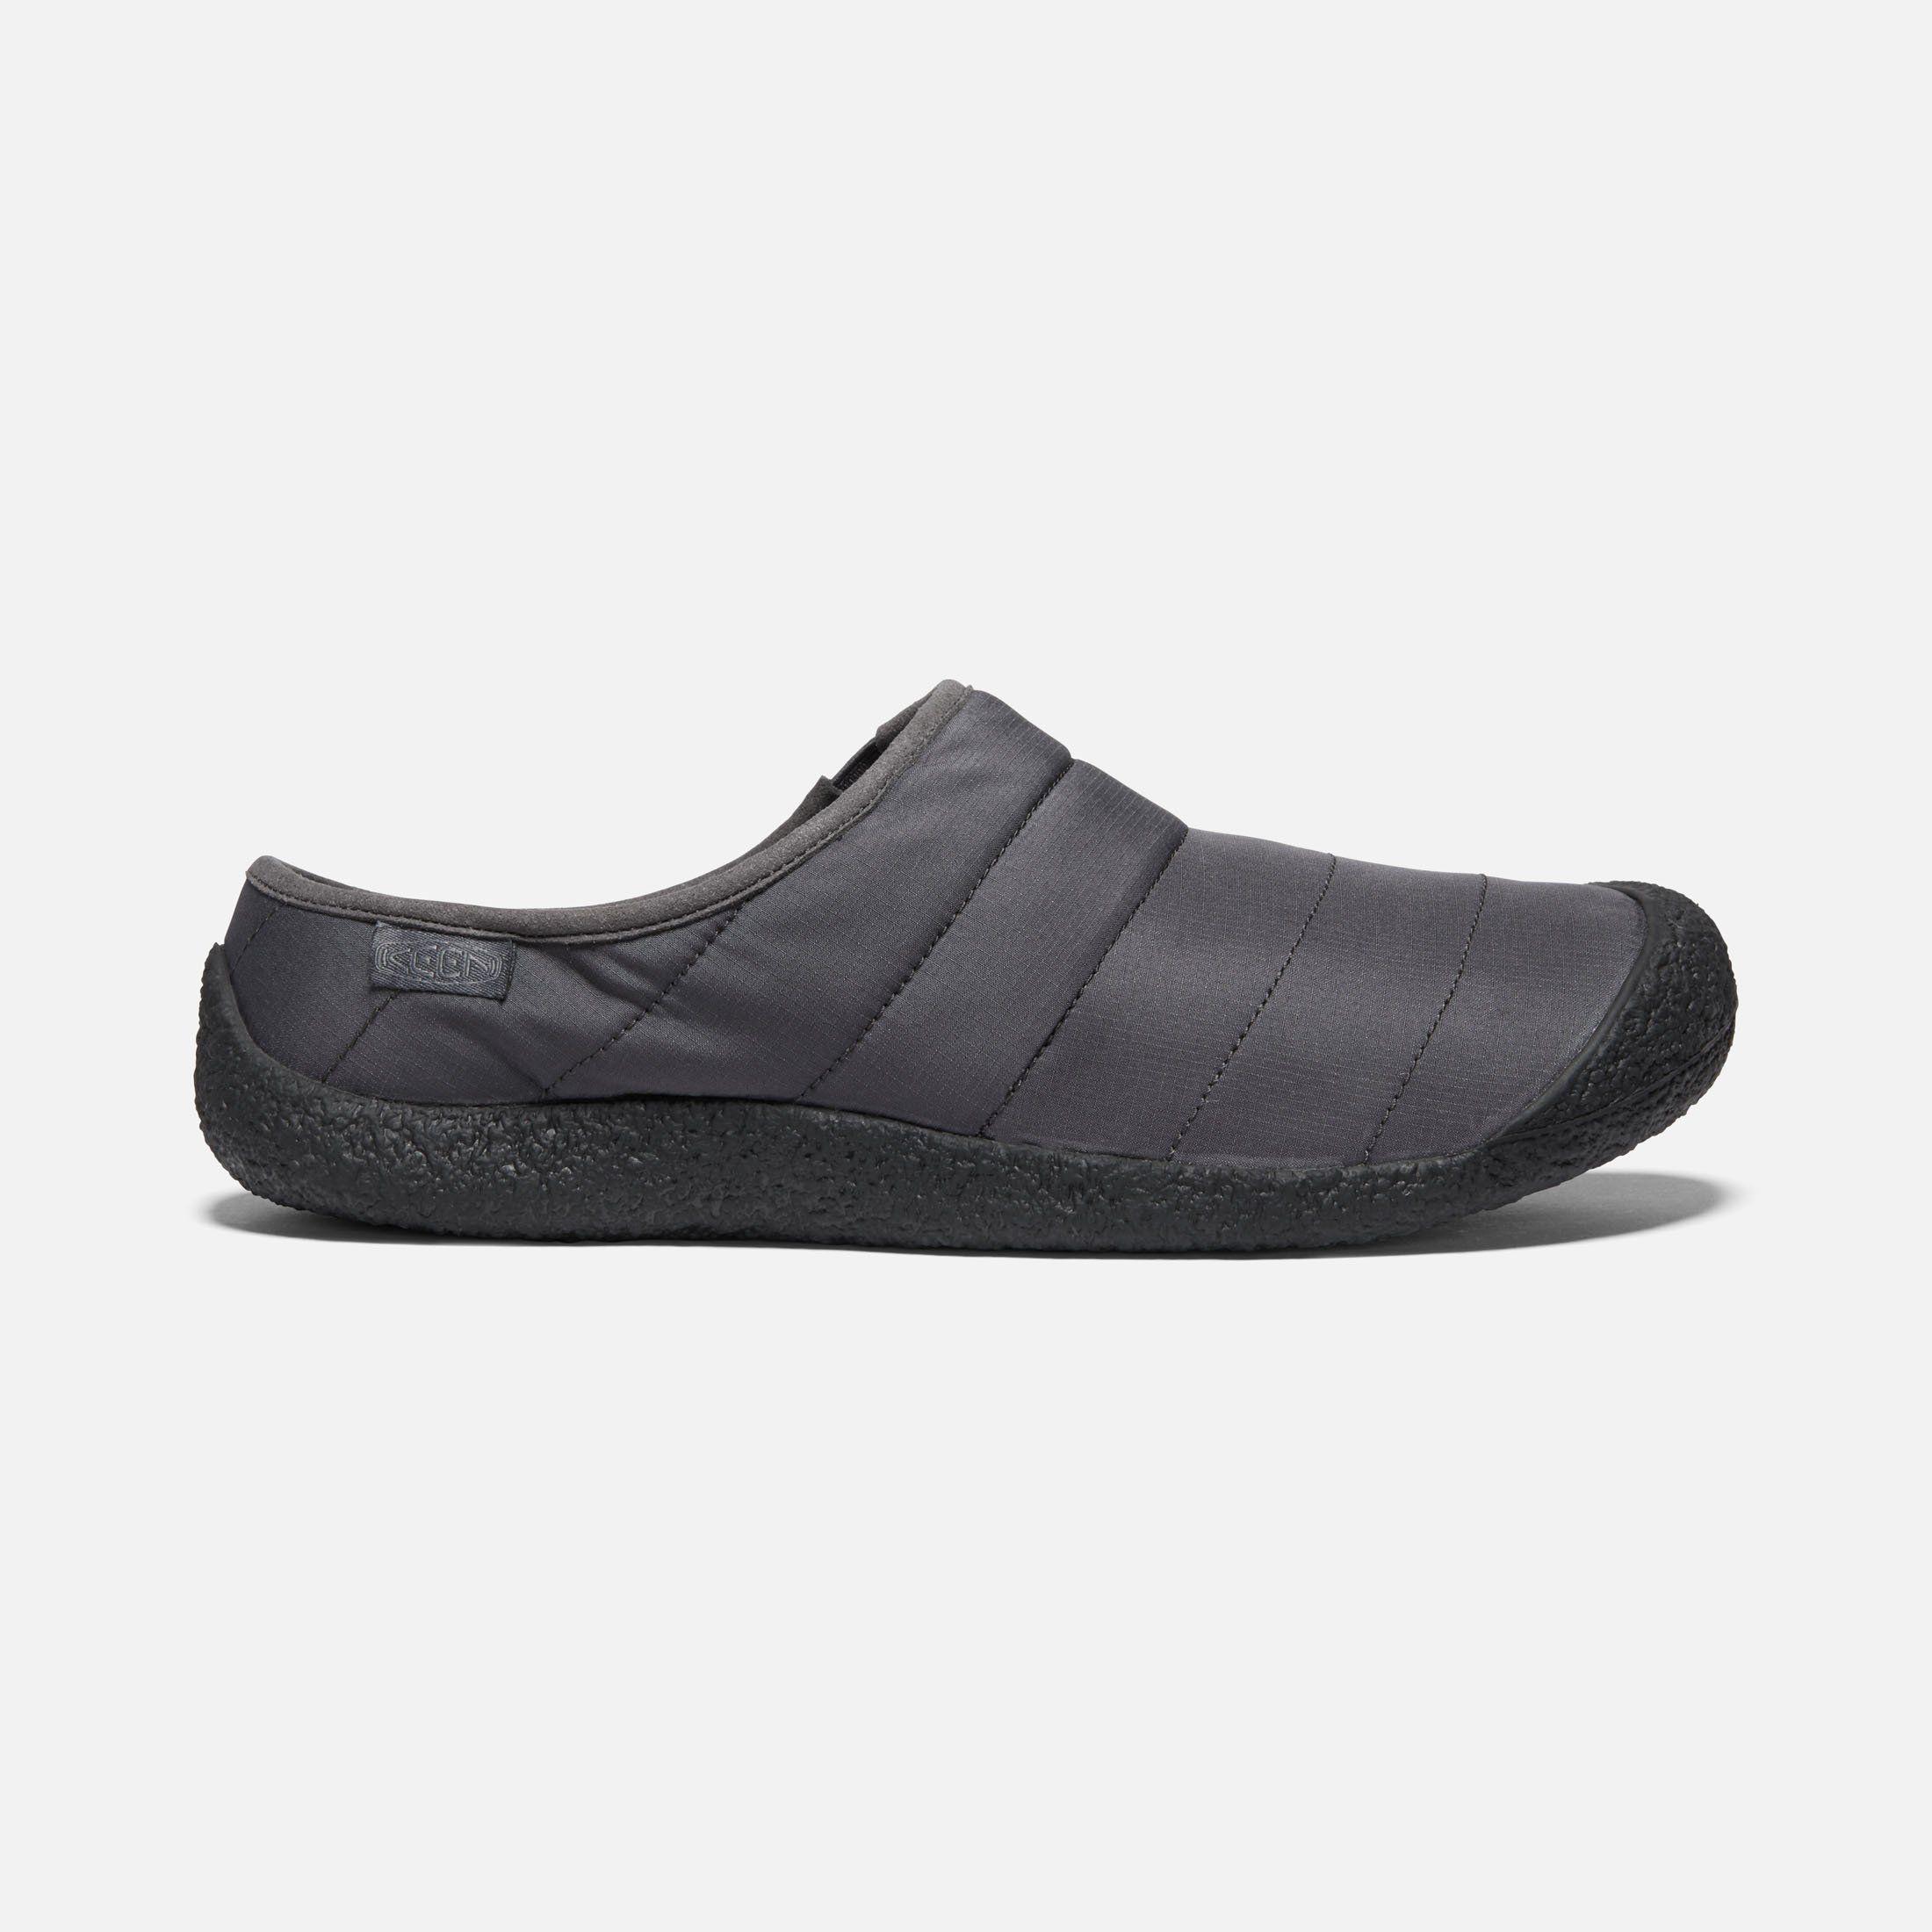 Slide Slides Sandals Black//Grey Size 12 NIB New Balance Men/'s Cush